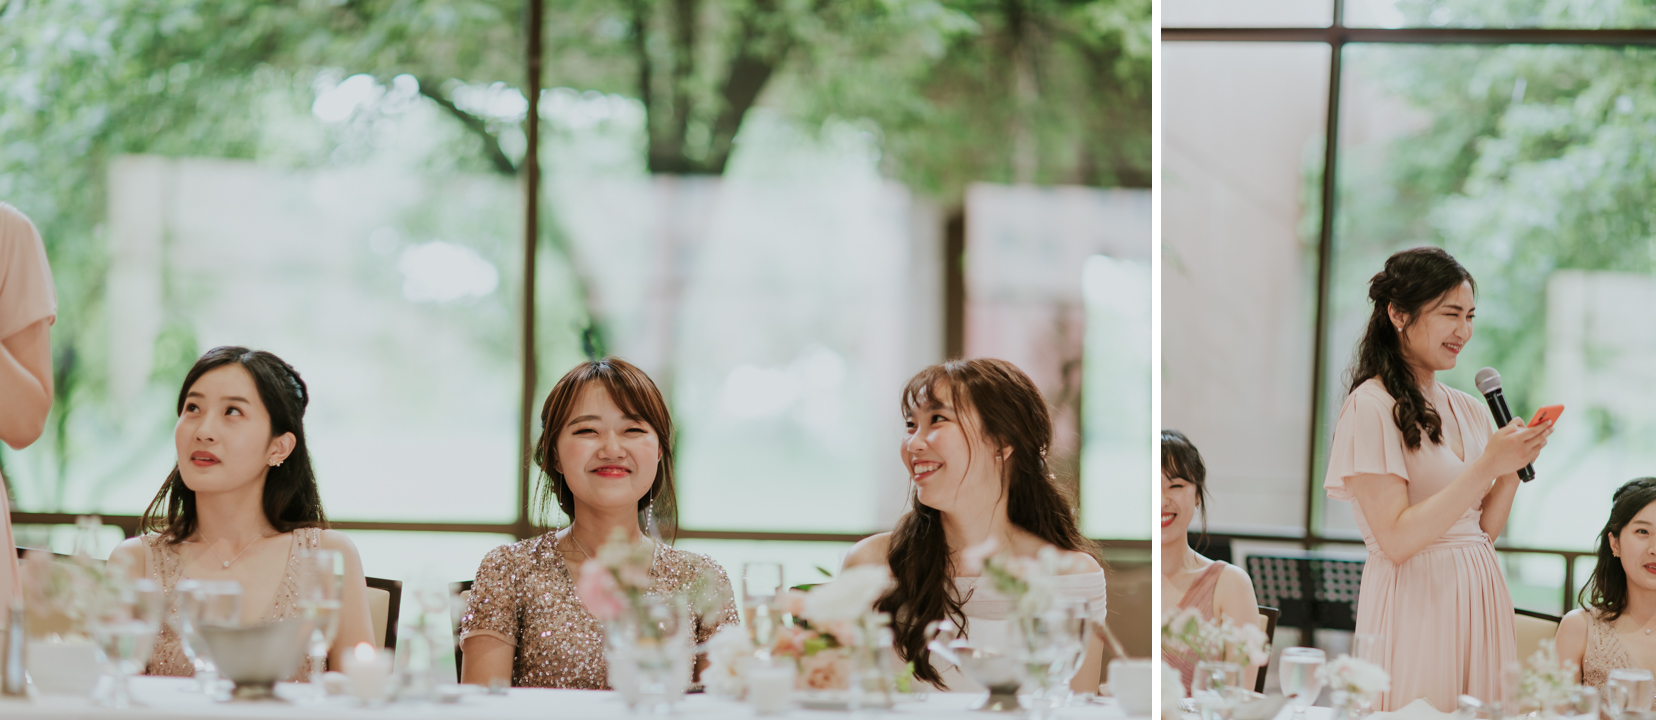 LGP-ann-arbor-eagle-crest-wedding-060.jpg